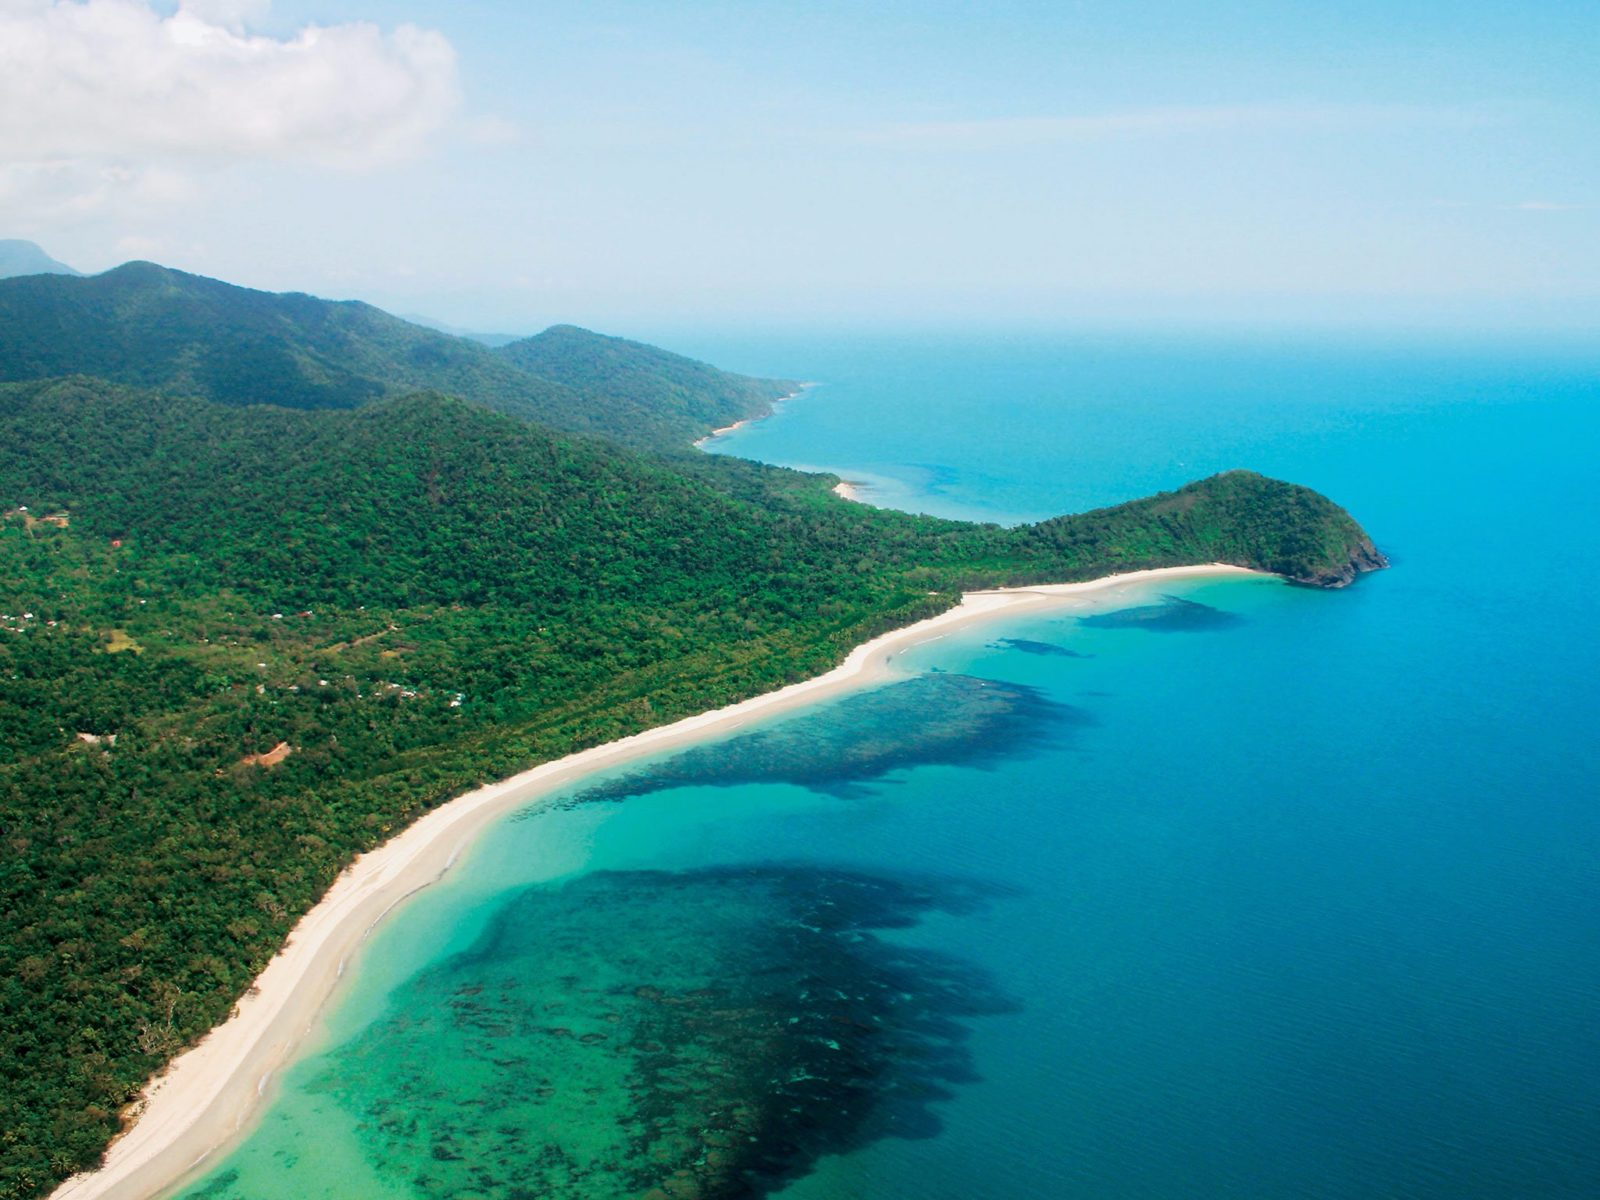 Cape Tribulation rainforest meets the reef